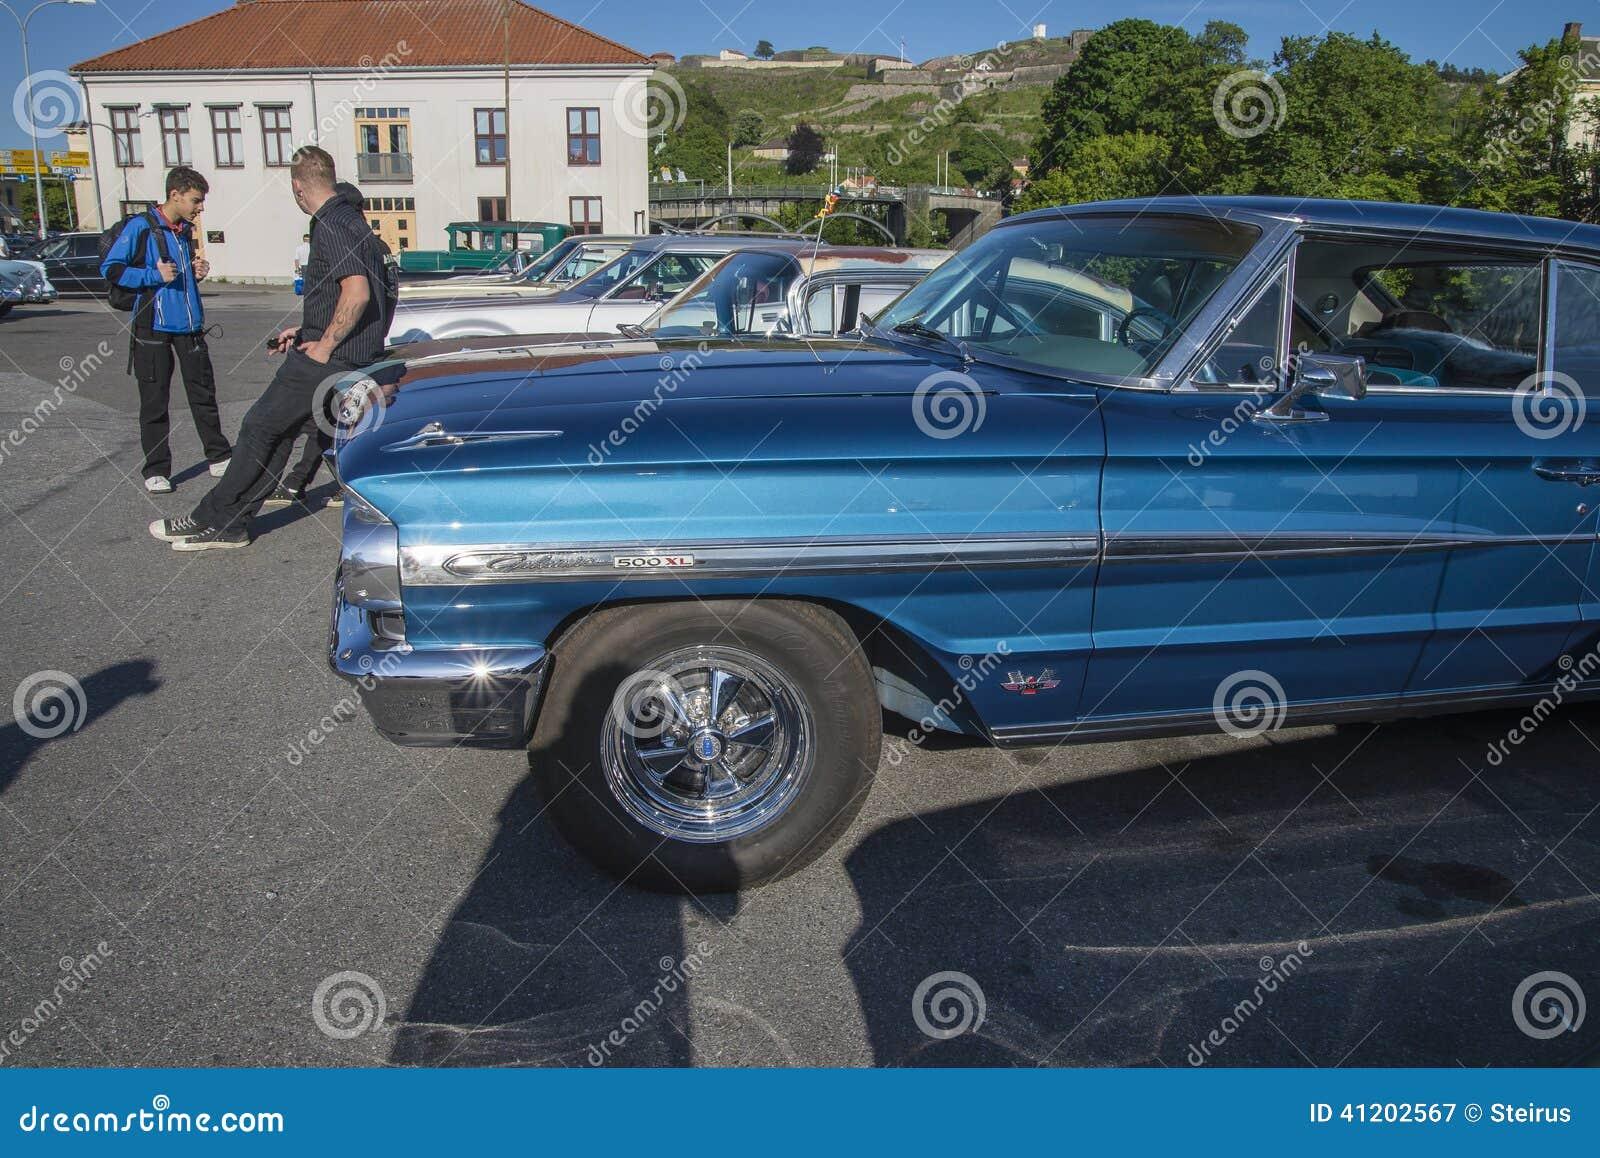 1964 Ford Galaxie 500 Xl 2 Door Hardtop Editorial Photography